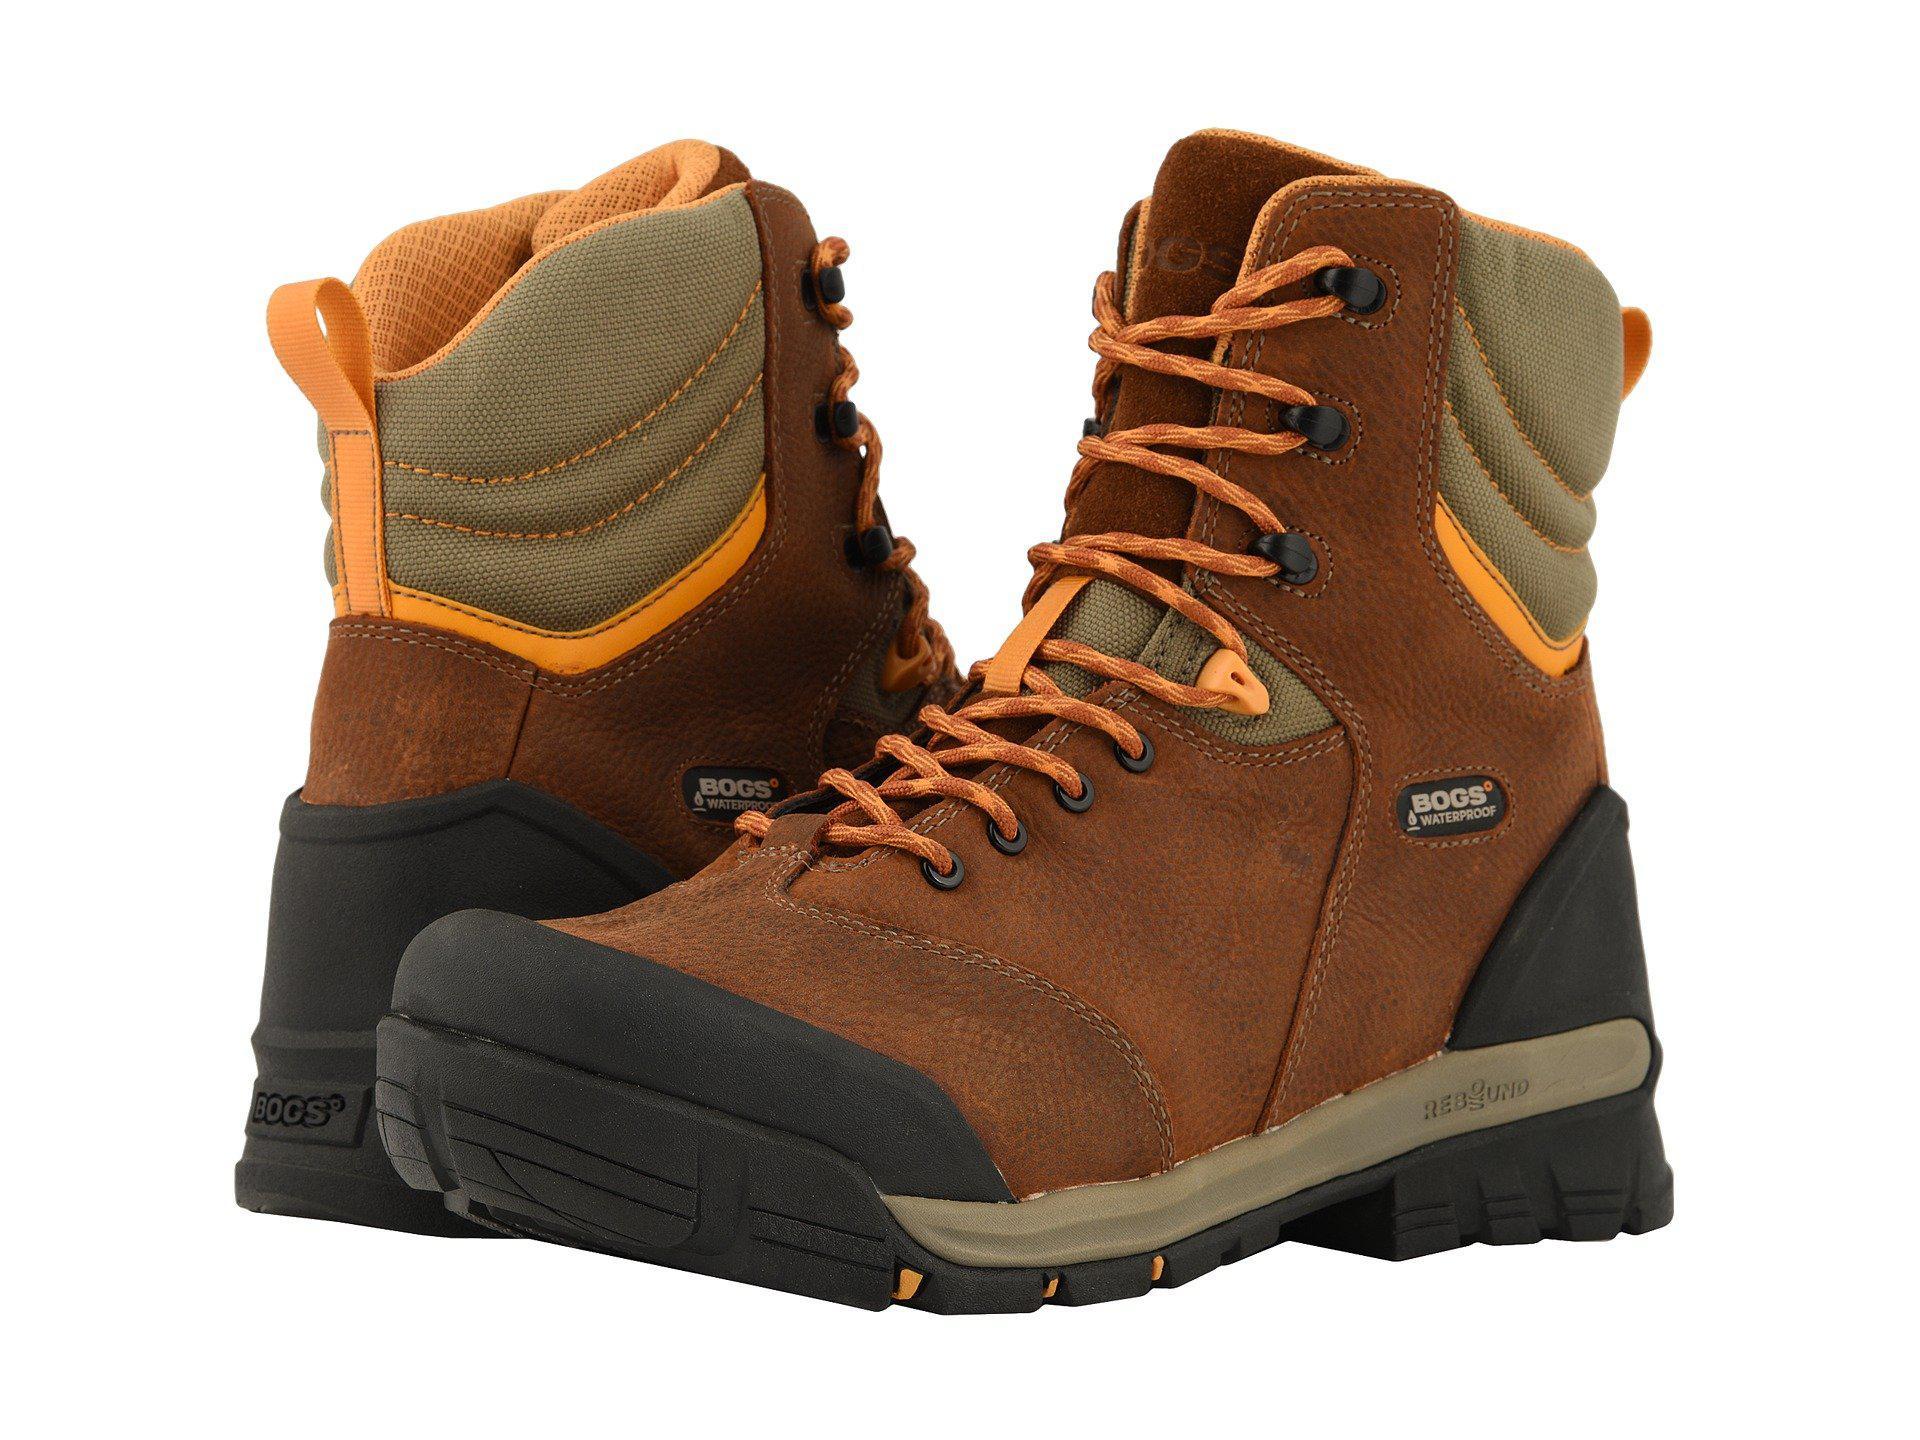 bd1147770ef Lyst - Bogs Bed Rock 8 Insulated Composite Toe (black Multi) Men's ...